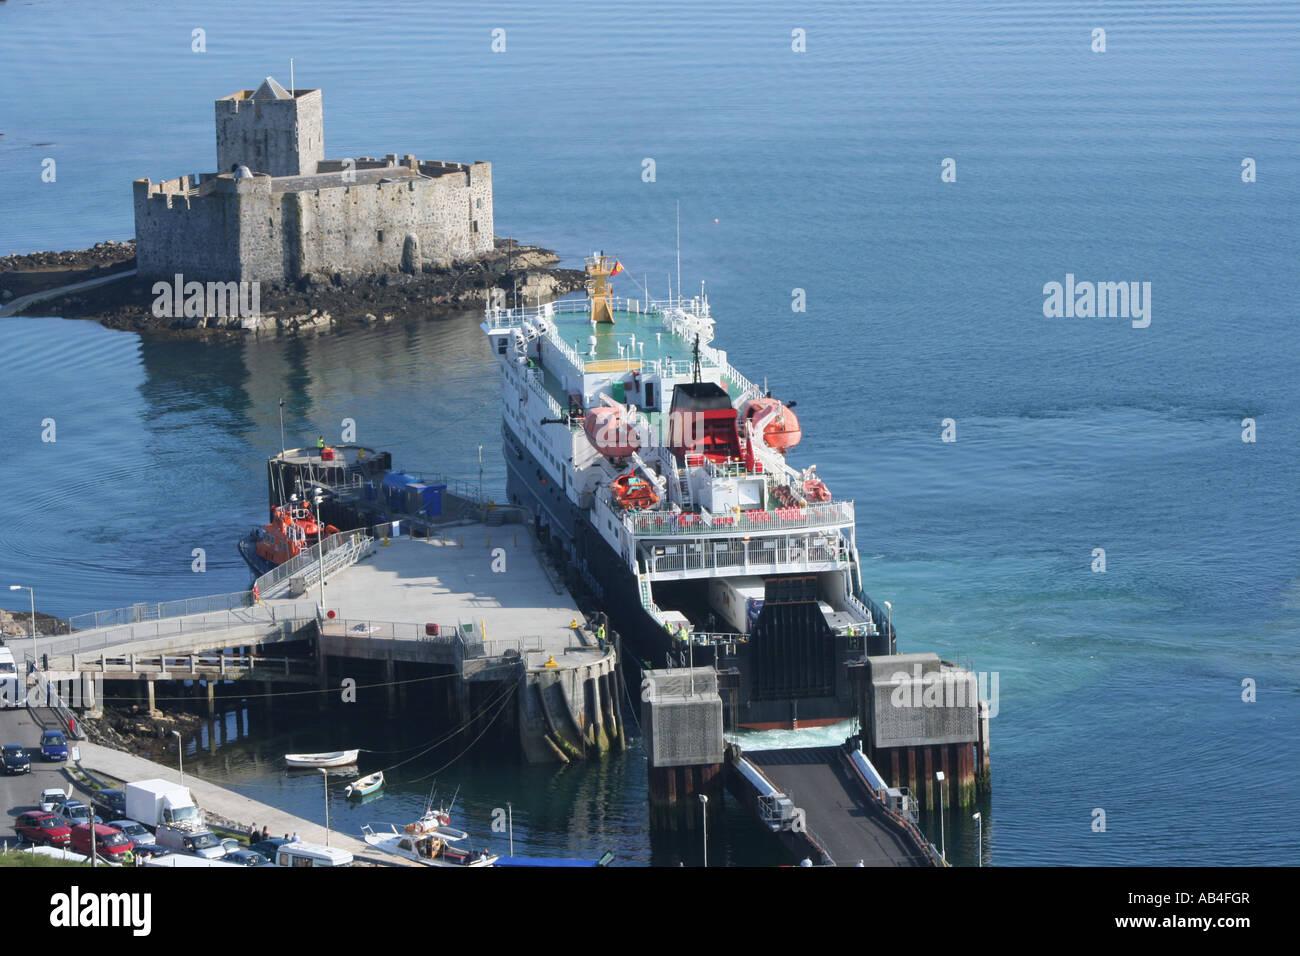 Clansman part of the Caledonian MacBrayne fleet docking at Castlebay with Kisimul castle isle of Barra Scotland - Stock Image